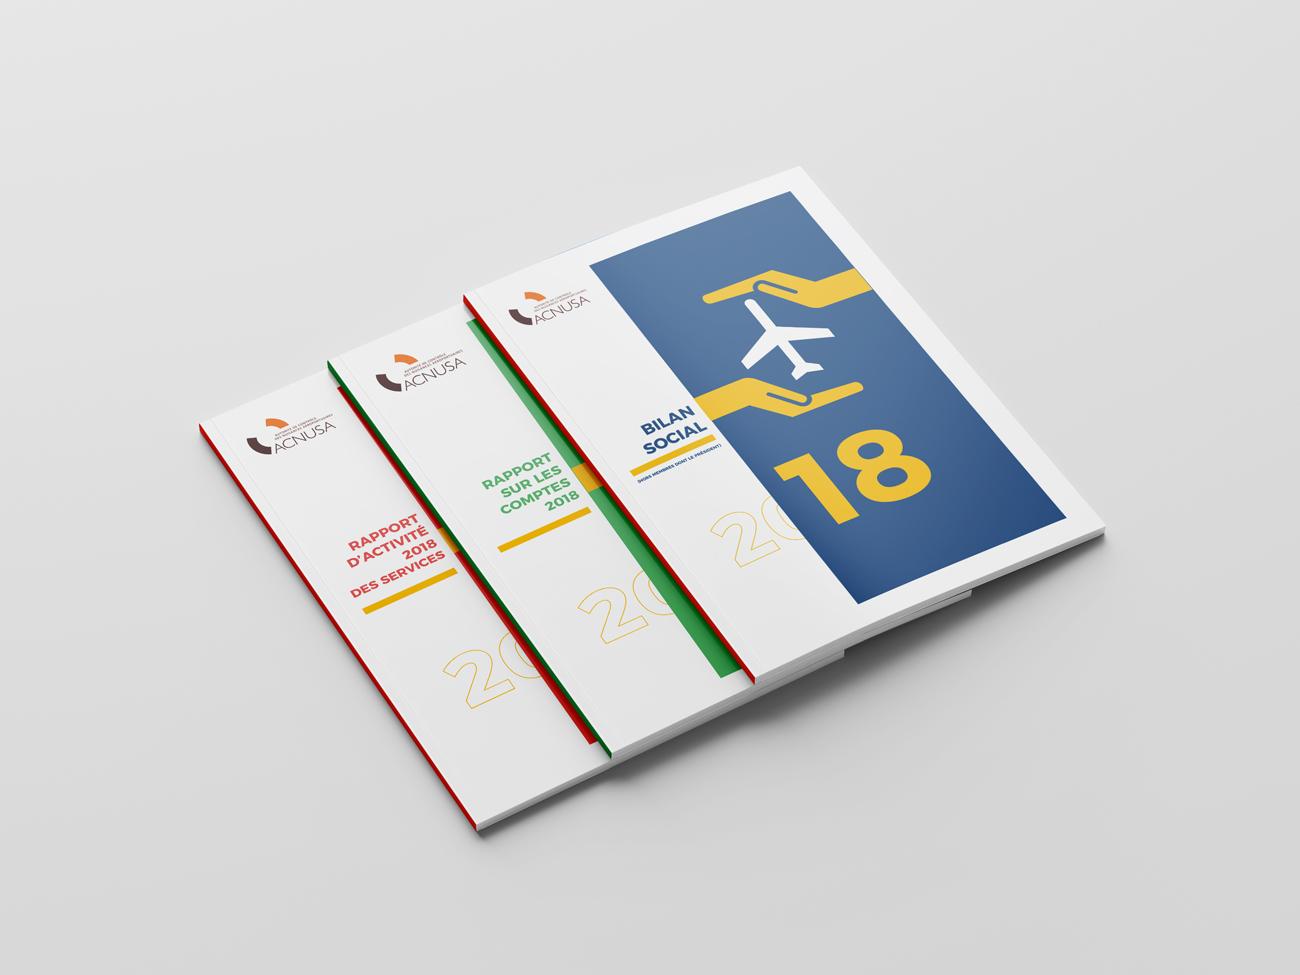 ACNUSA-Rapport-annuel-2019-conception-wala-studio-graphique6